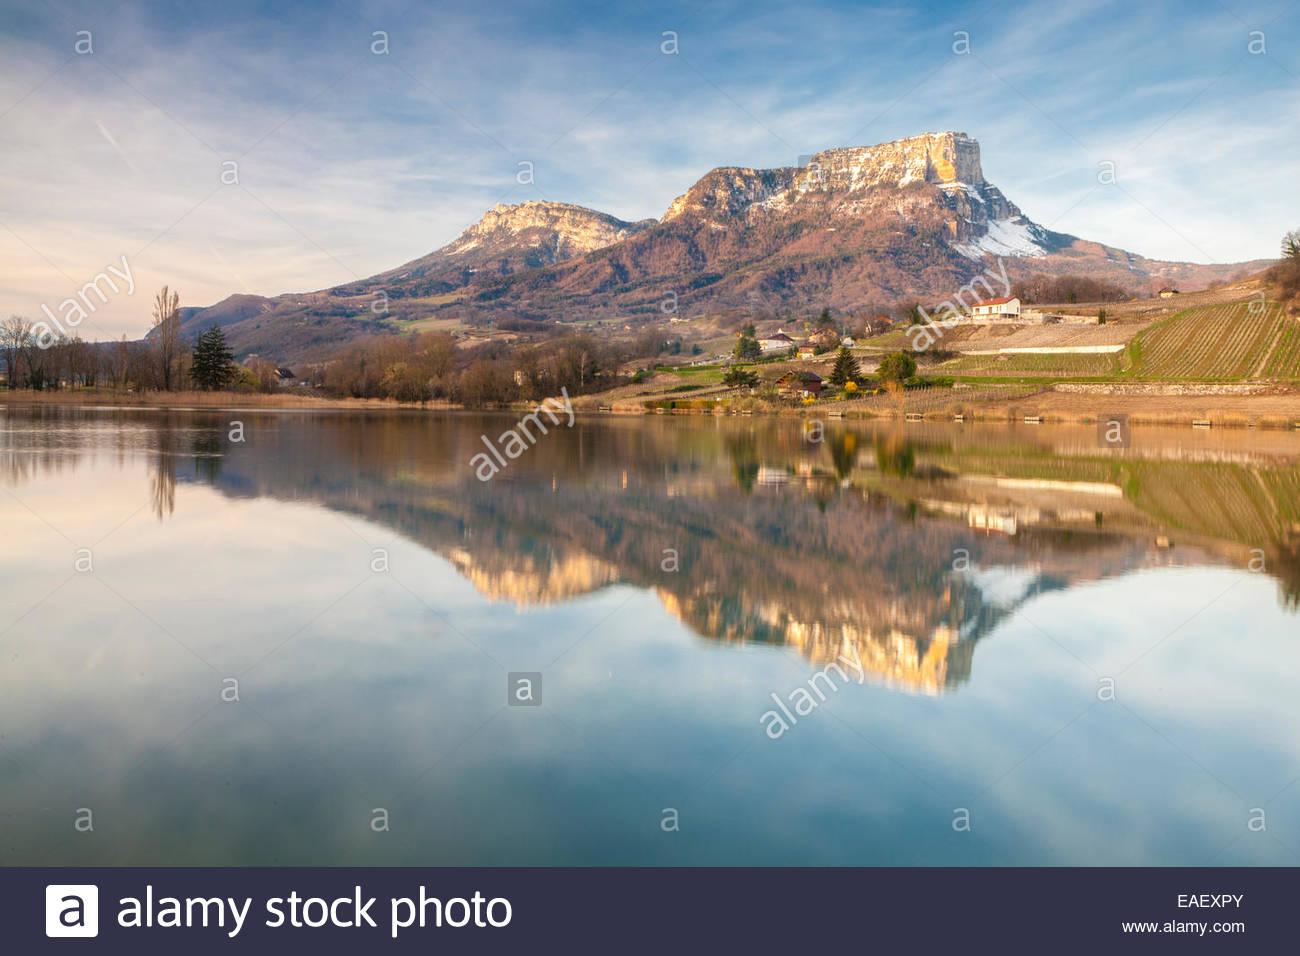 Mount granier clipart #8